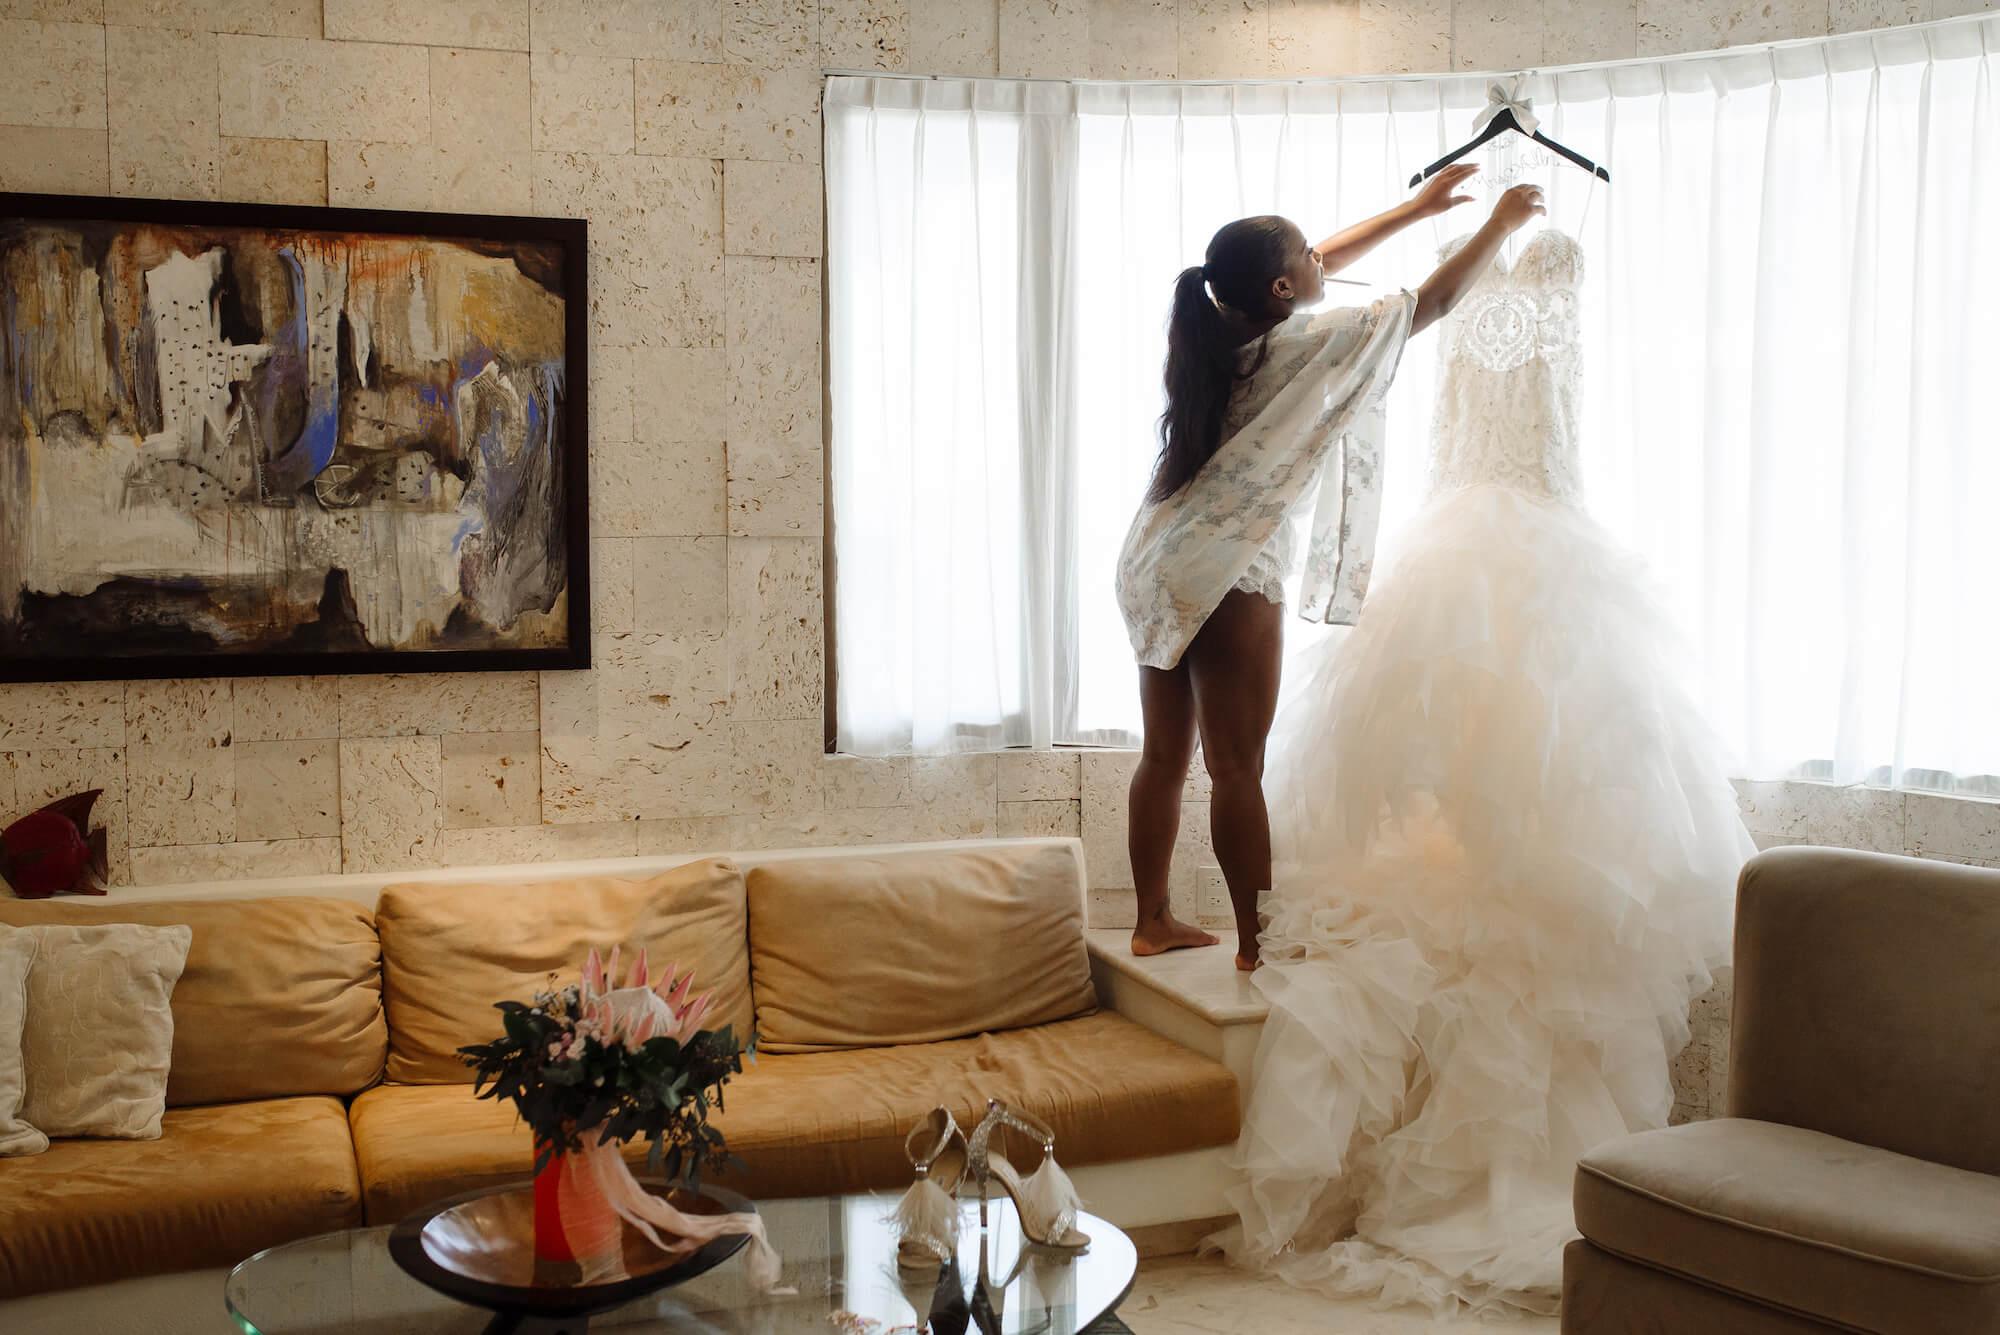 destiland-desti-sweating-for-the-destination-wedding-ready-workouts-2019-legs-booty.jpg